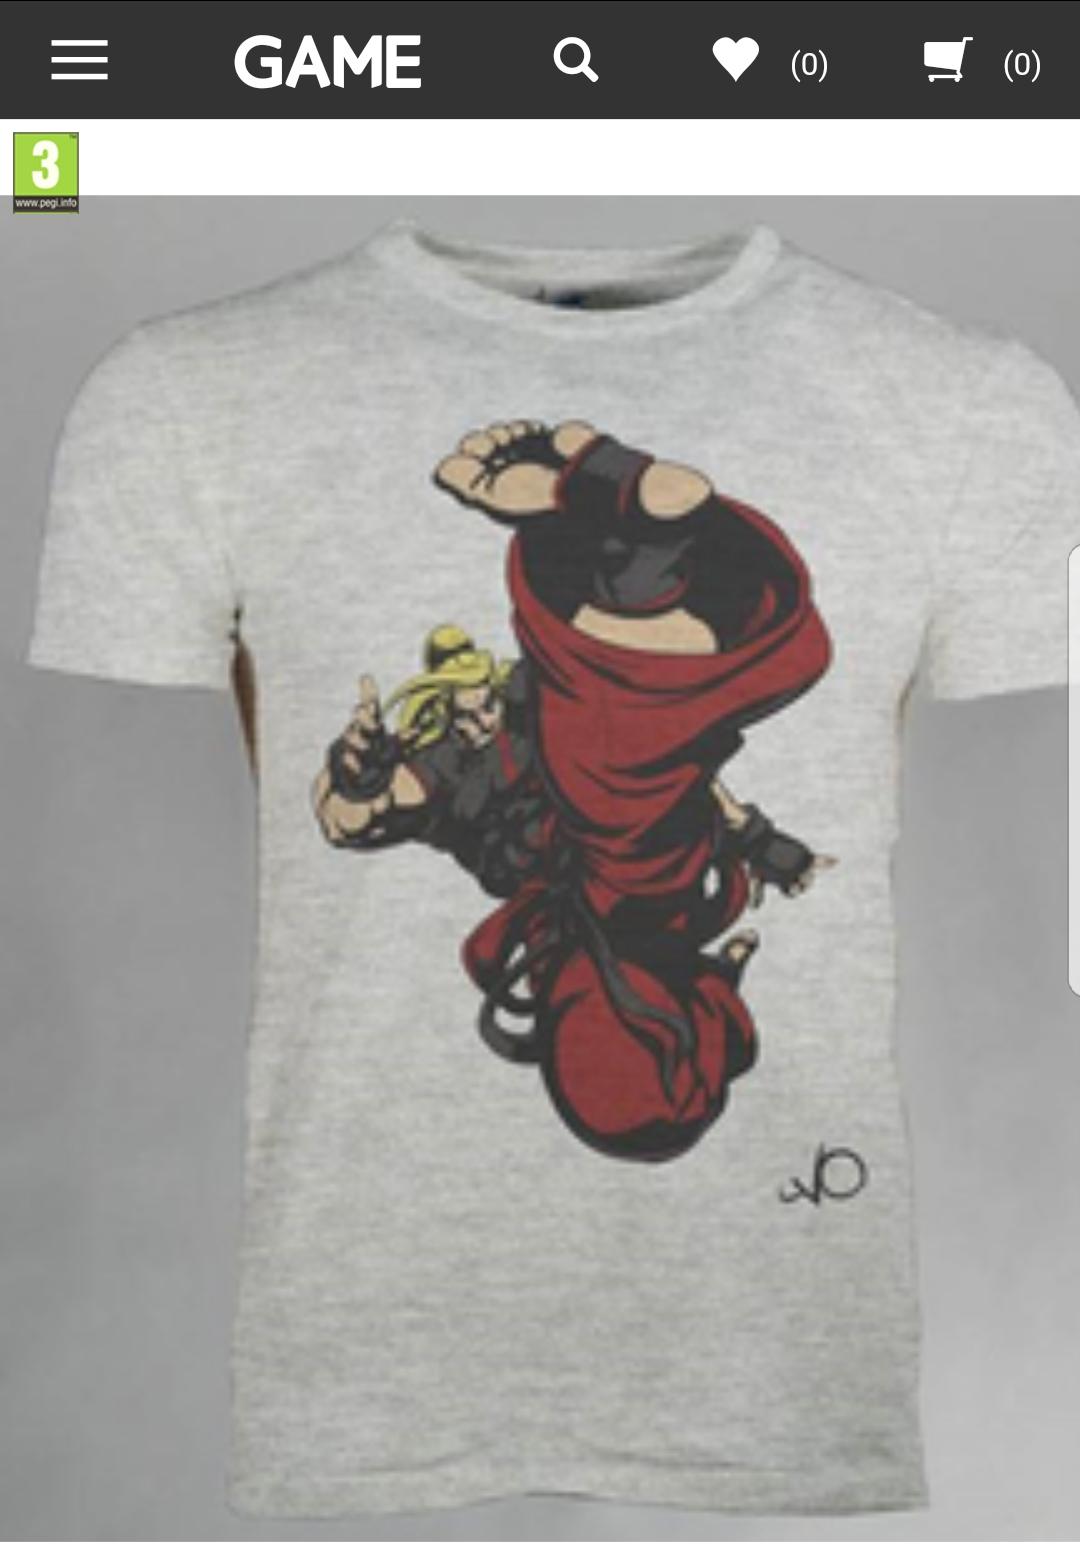 Street Fighter V Ken T-shirt - X-Large (XL + M) @ GAME £3.99